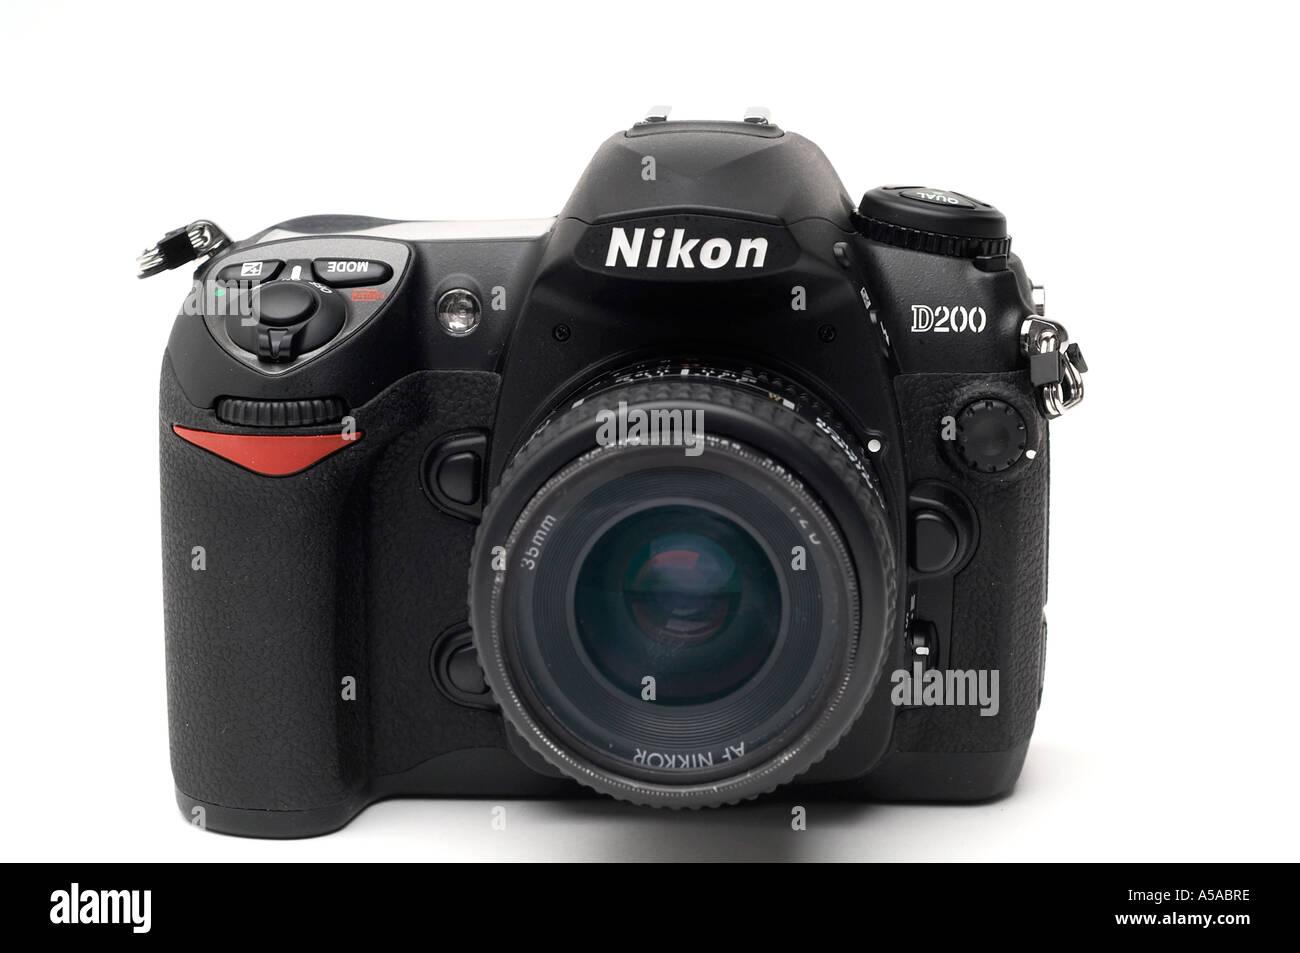 Nikon D200 digital SLR camera - Stock Image